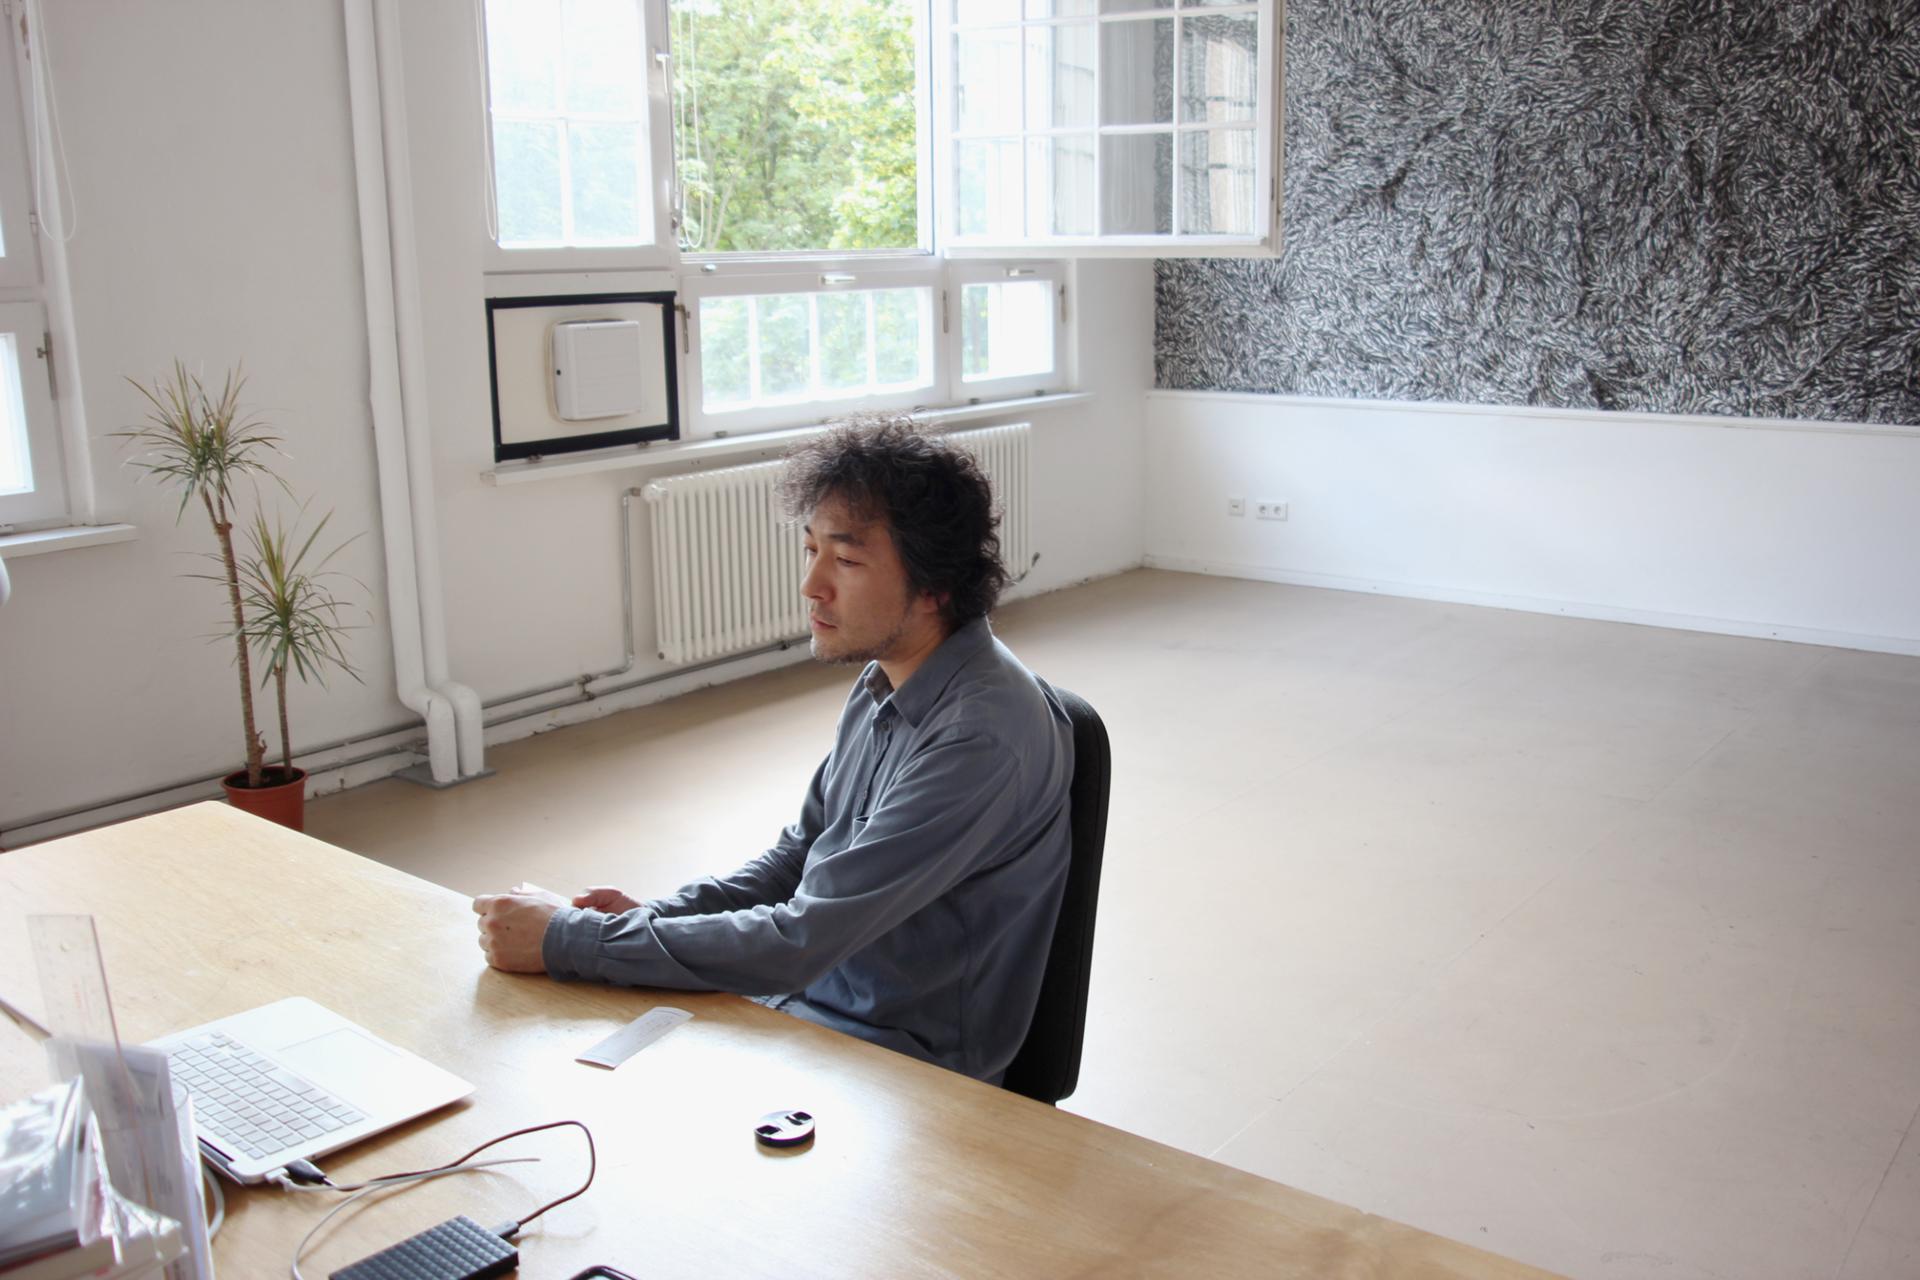 Portrait Hajime Mizutani, 2019 Location: Artist's Studio of KÜNSTLERHAUS BETHANIEN, Berlin, Germany